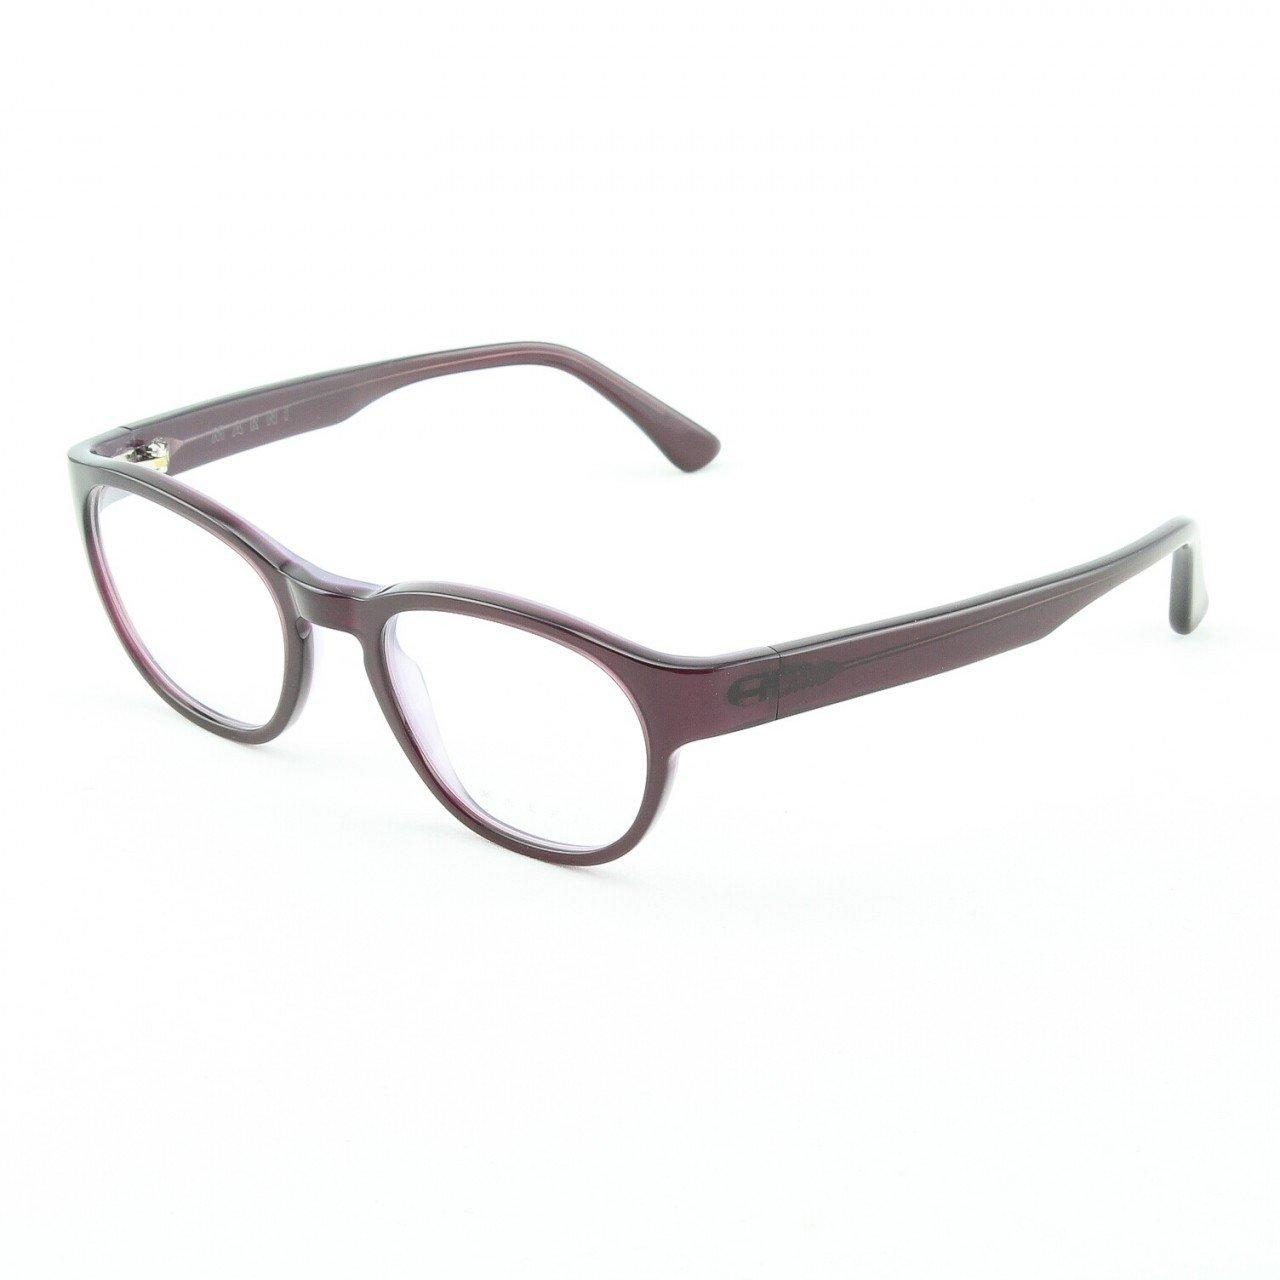 Marni MA630S Eyeglasses Col. 46 Deep Plum Translucent Frame with Clear Lenses